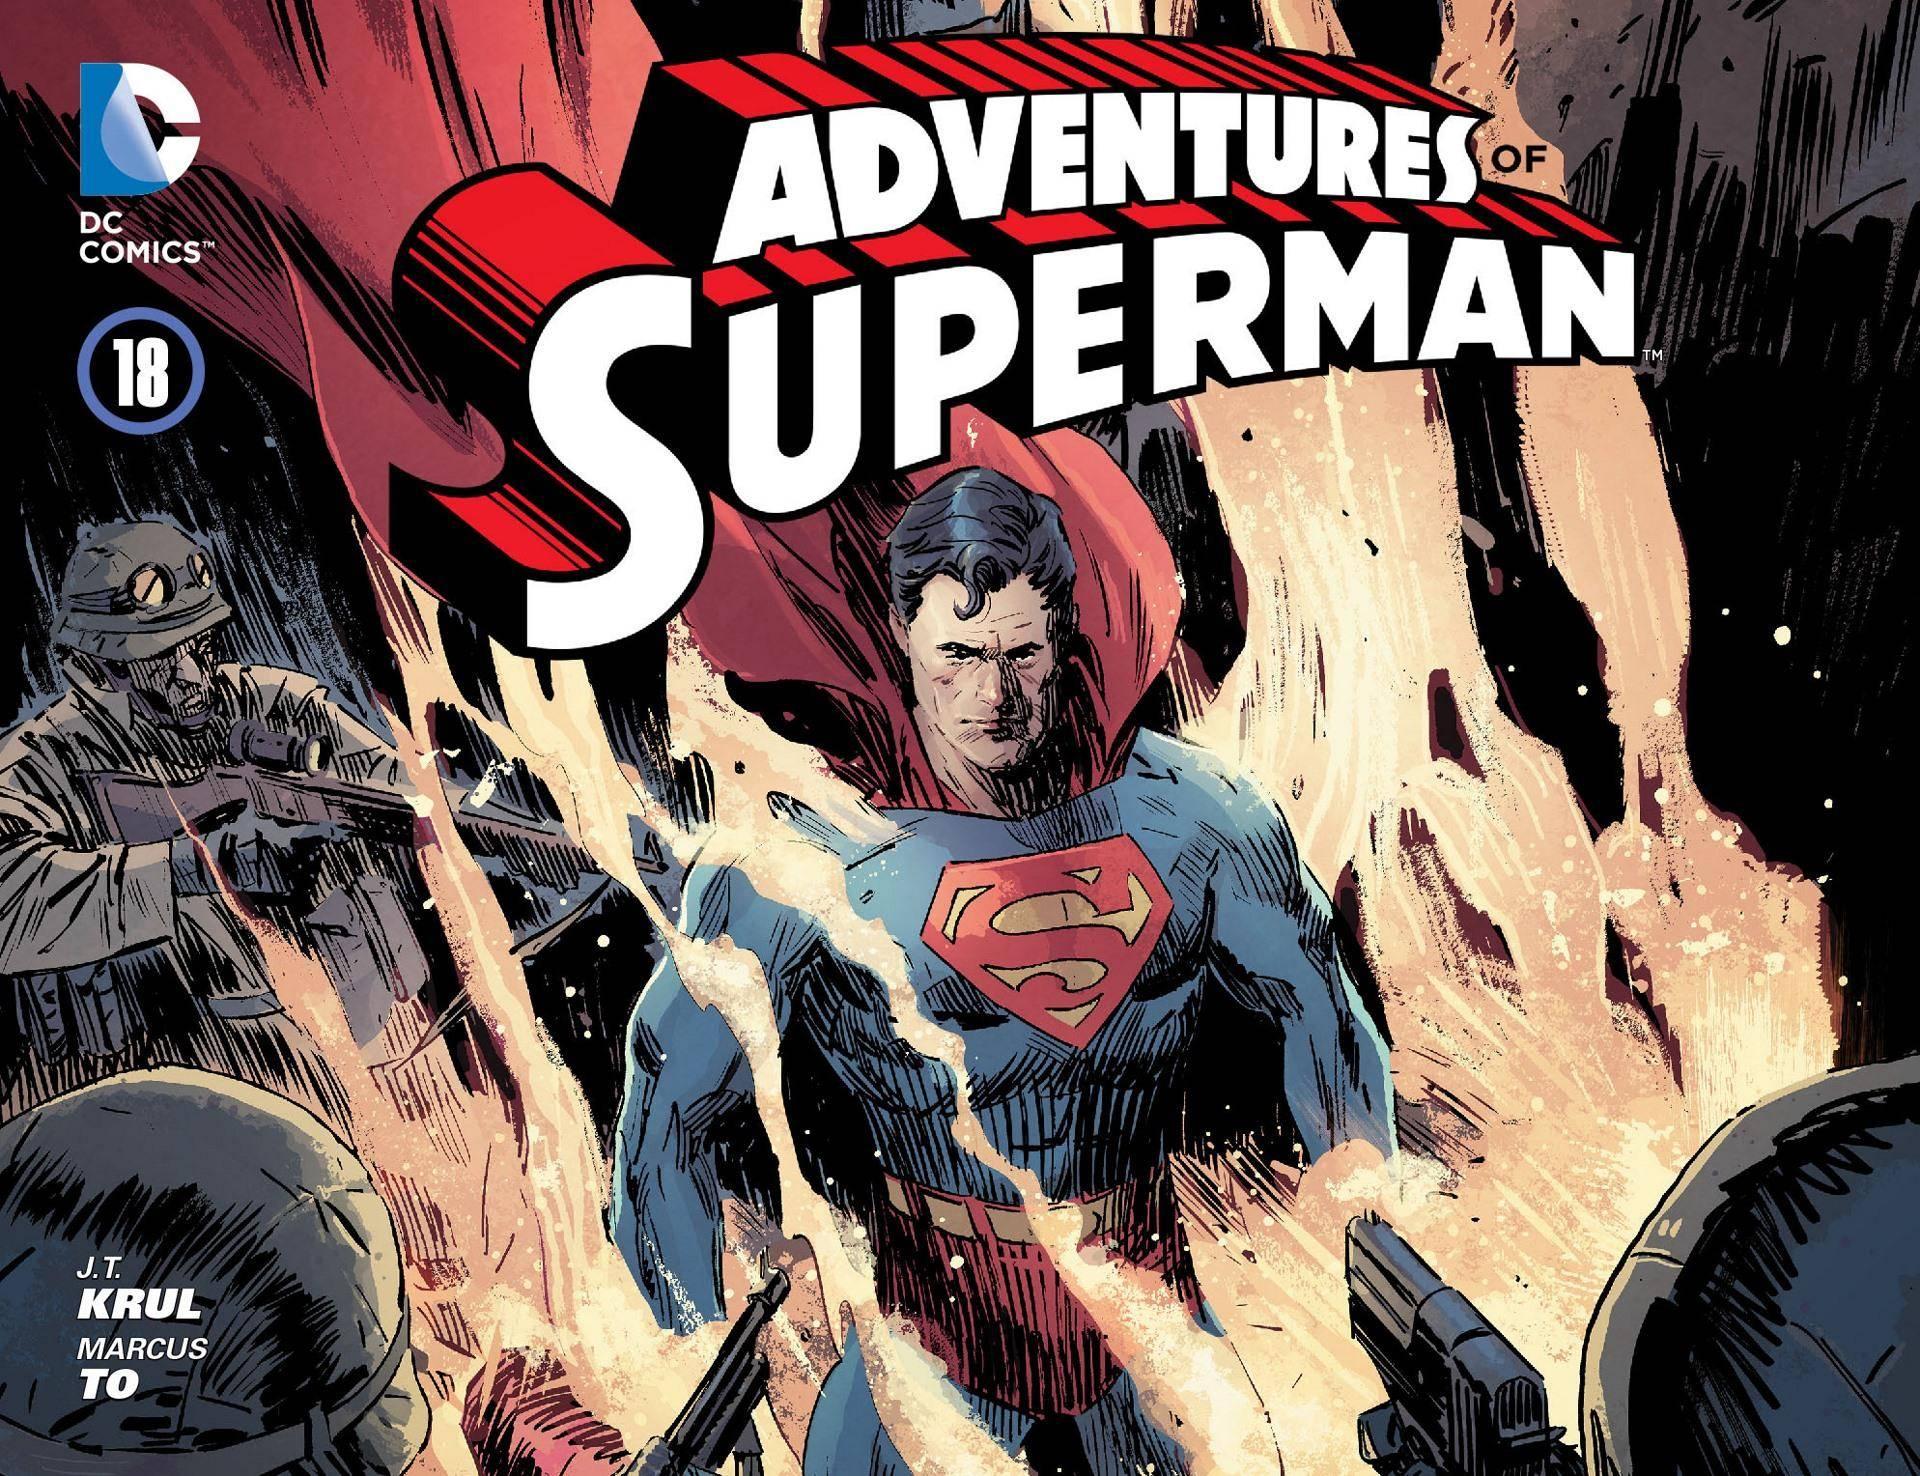 Adventures of Superman 018 2013 Digital